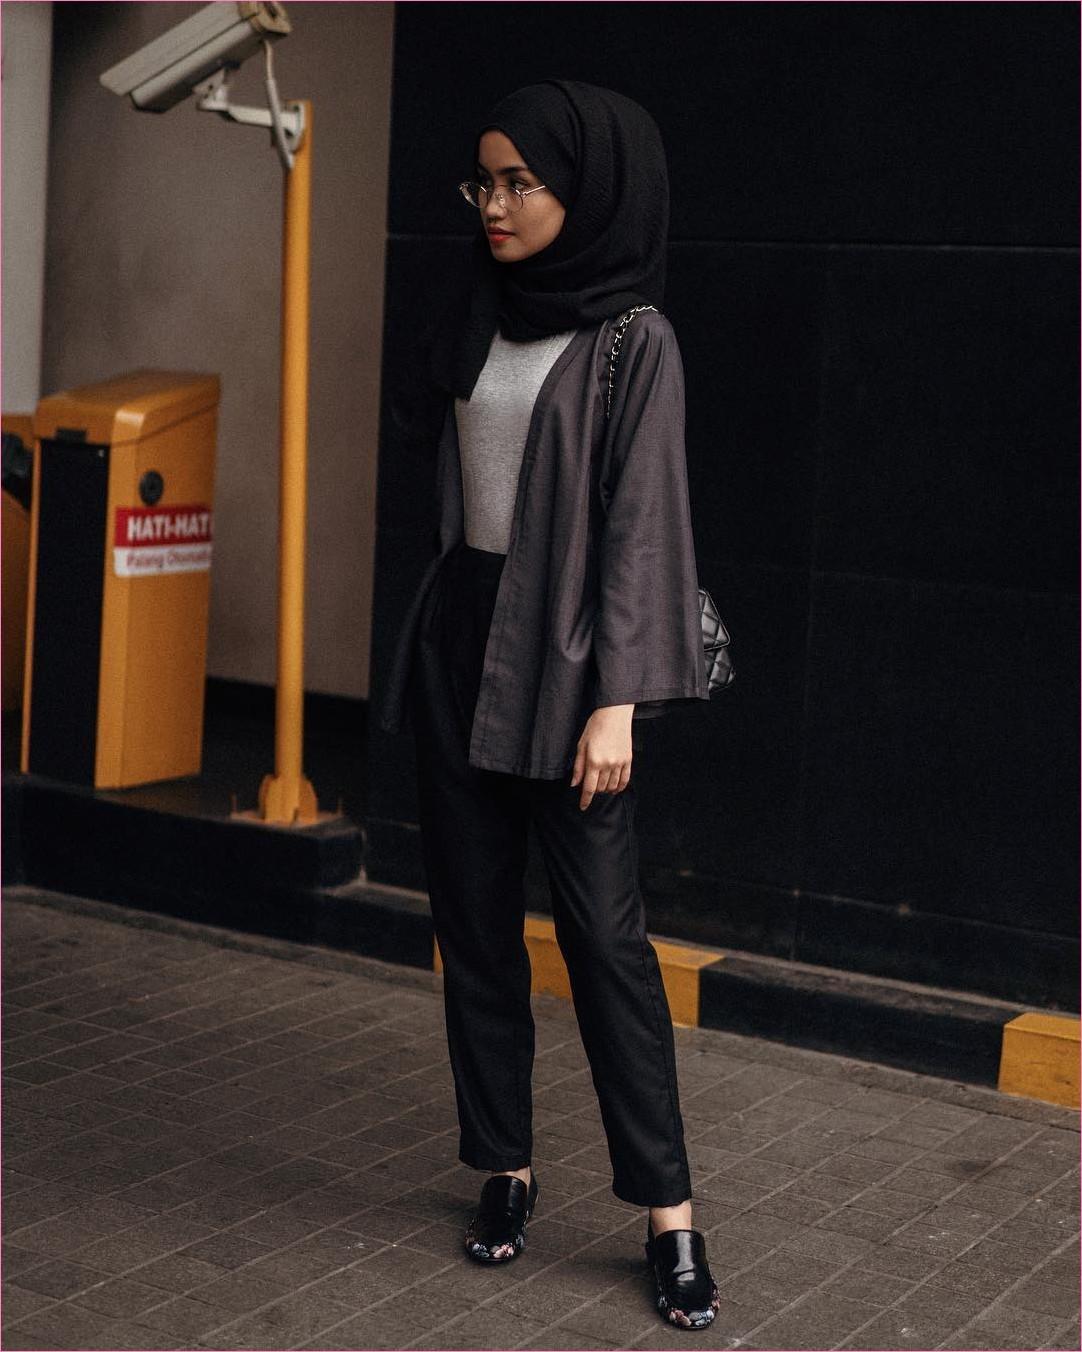 Outfit Untuk Remaja Berhijab Yang Mempunyai Tubuh Pendek Tapi Mau Kelihatan Tinggi 2018 hijab pashmina rawis celana bahan loafers and slip ons slingbags hitam channel outer abu tua mangset abu muda kacamata bulat ootd trendy 2018 outfit selebgram